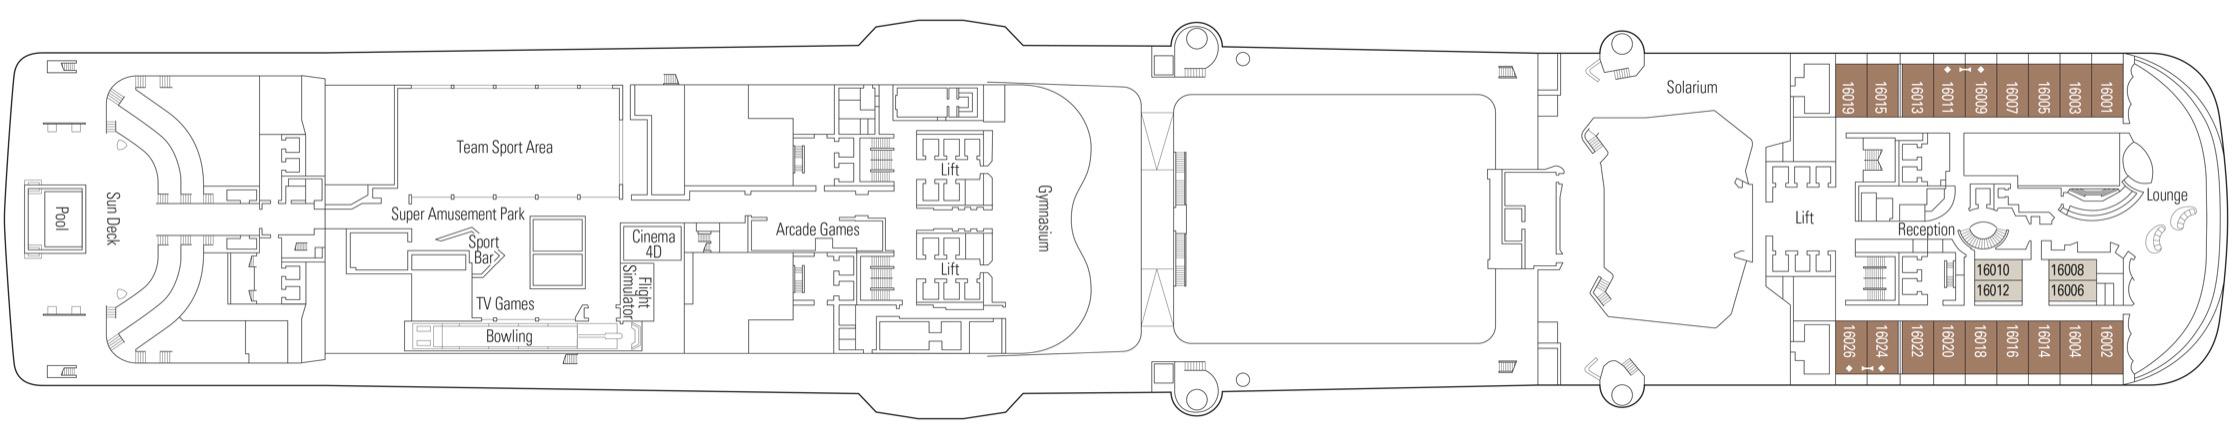 MSC Cruises MSC Meraviglia Deck 16.jpg